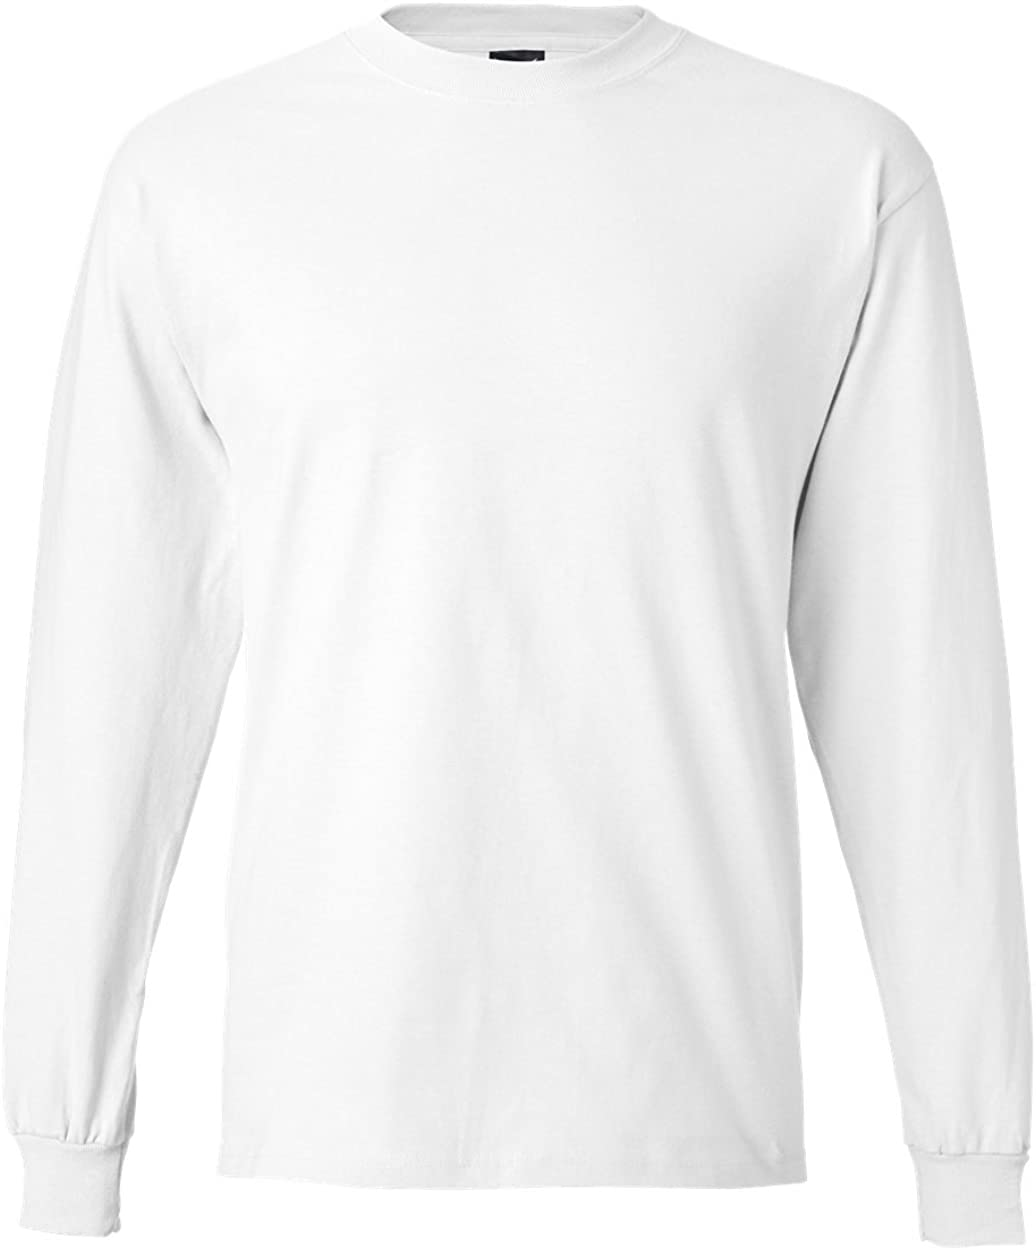 5186 Hanes Adult Beefy-T® Long-Sleeve T-Shirt